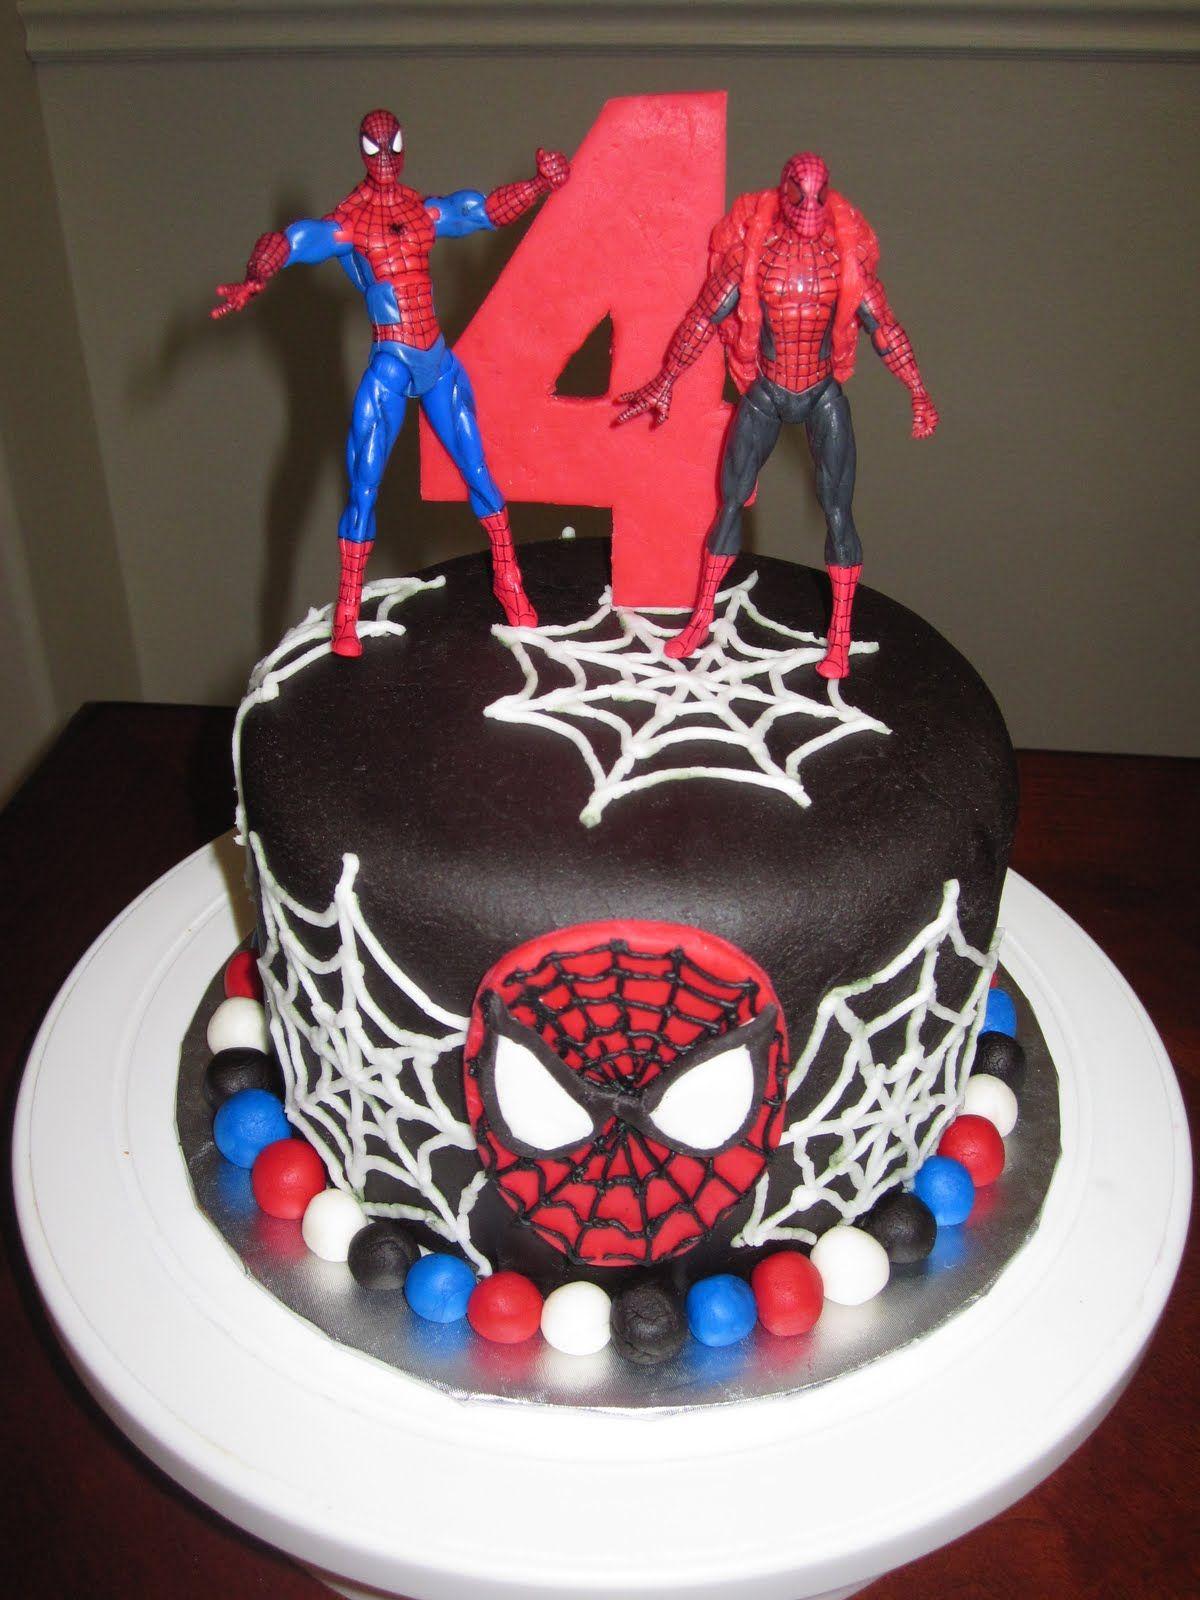 Google Images Spiderman Cake : Emaris Birthday Cake on Pinterest Cake Ideas, Birthday ...